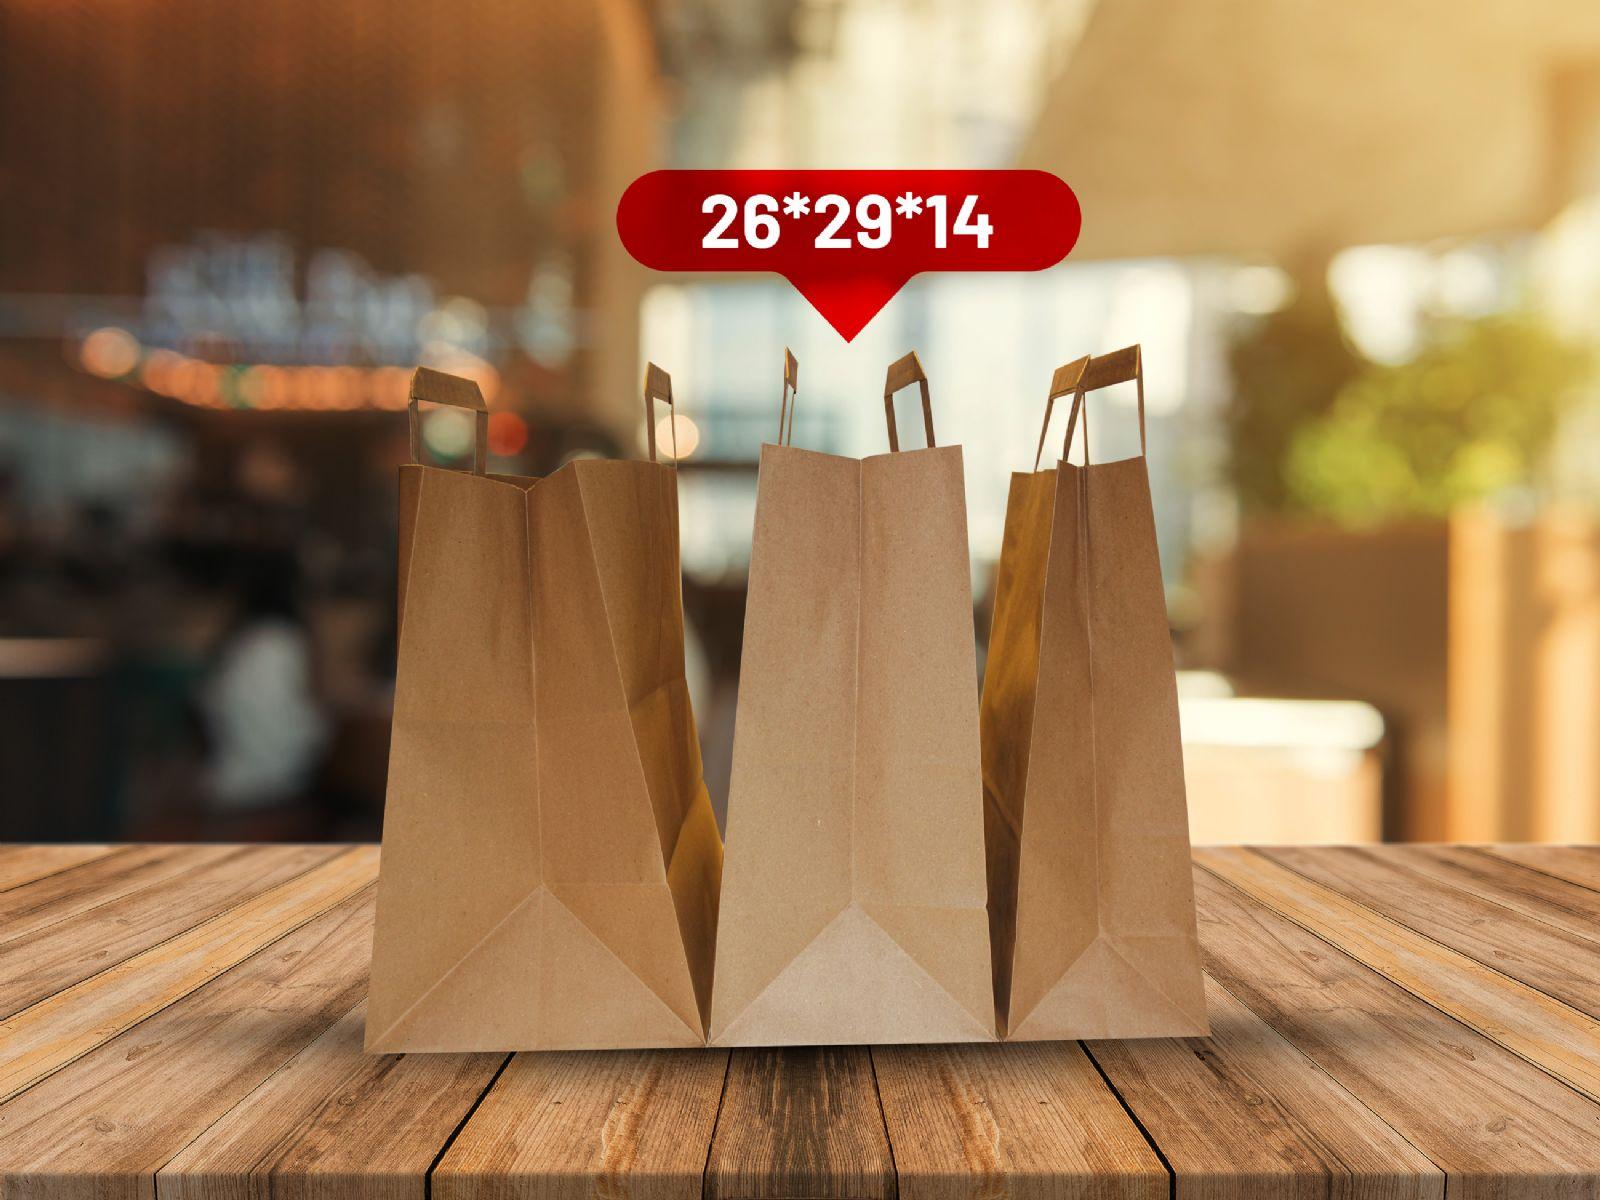 Kraft bags: 26*29*14